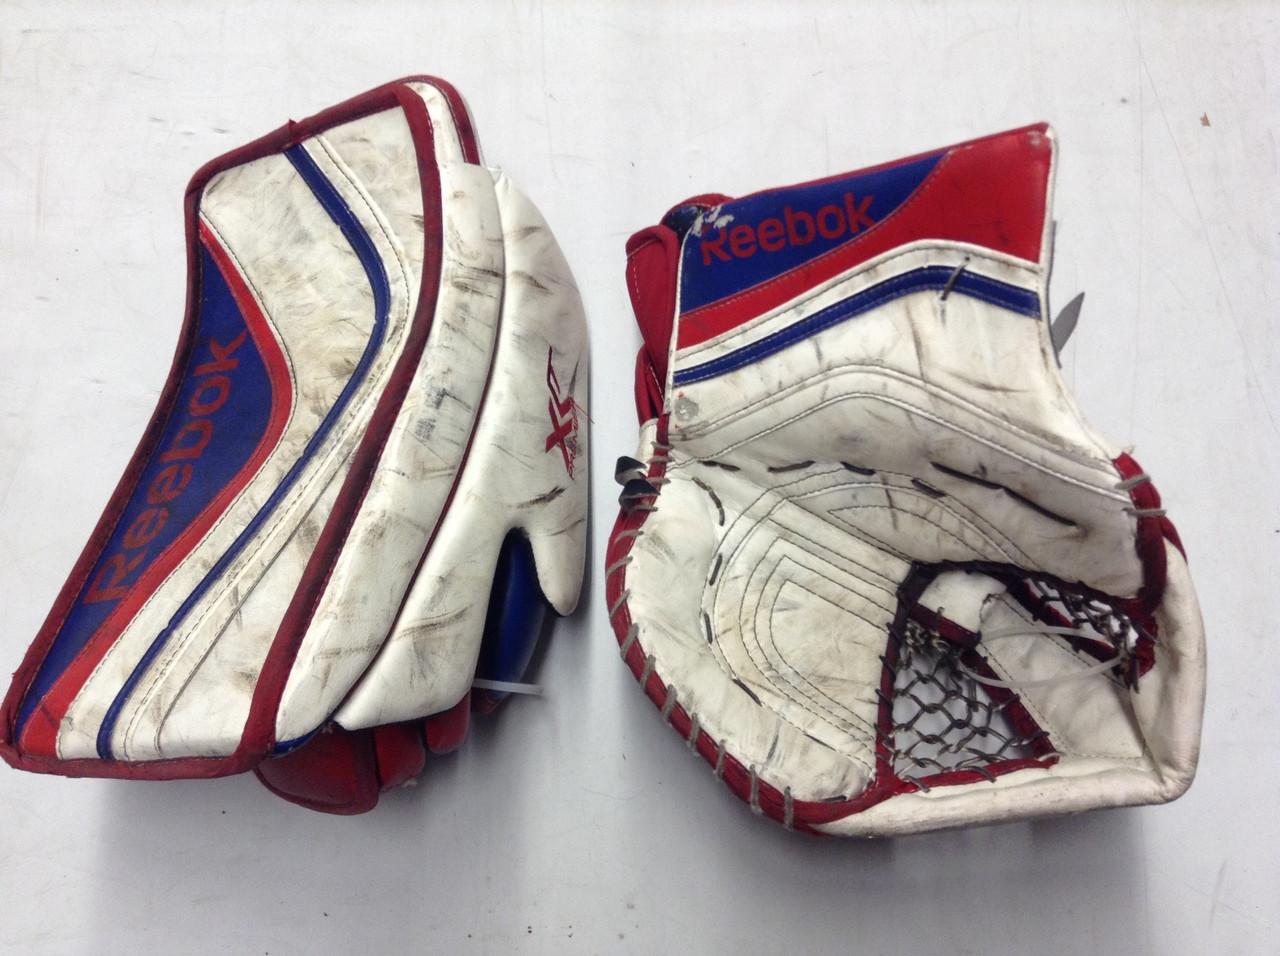 servidor Formación Casarse  Reebok XLT Goalie Glove and Blocker Pro stock NCAA - DK's Hockey Shop